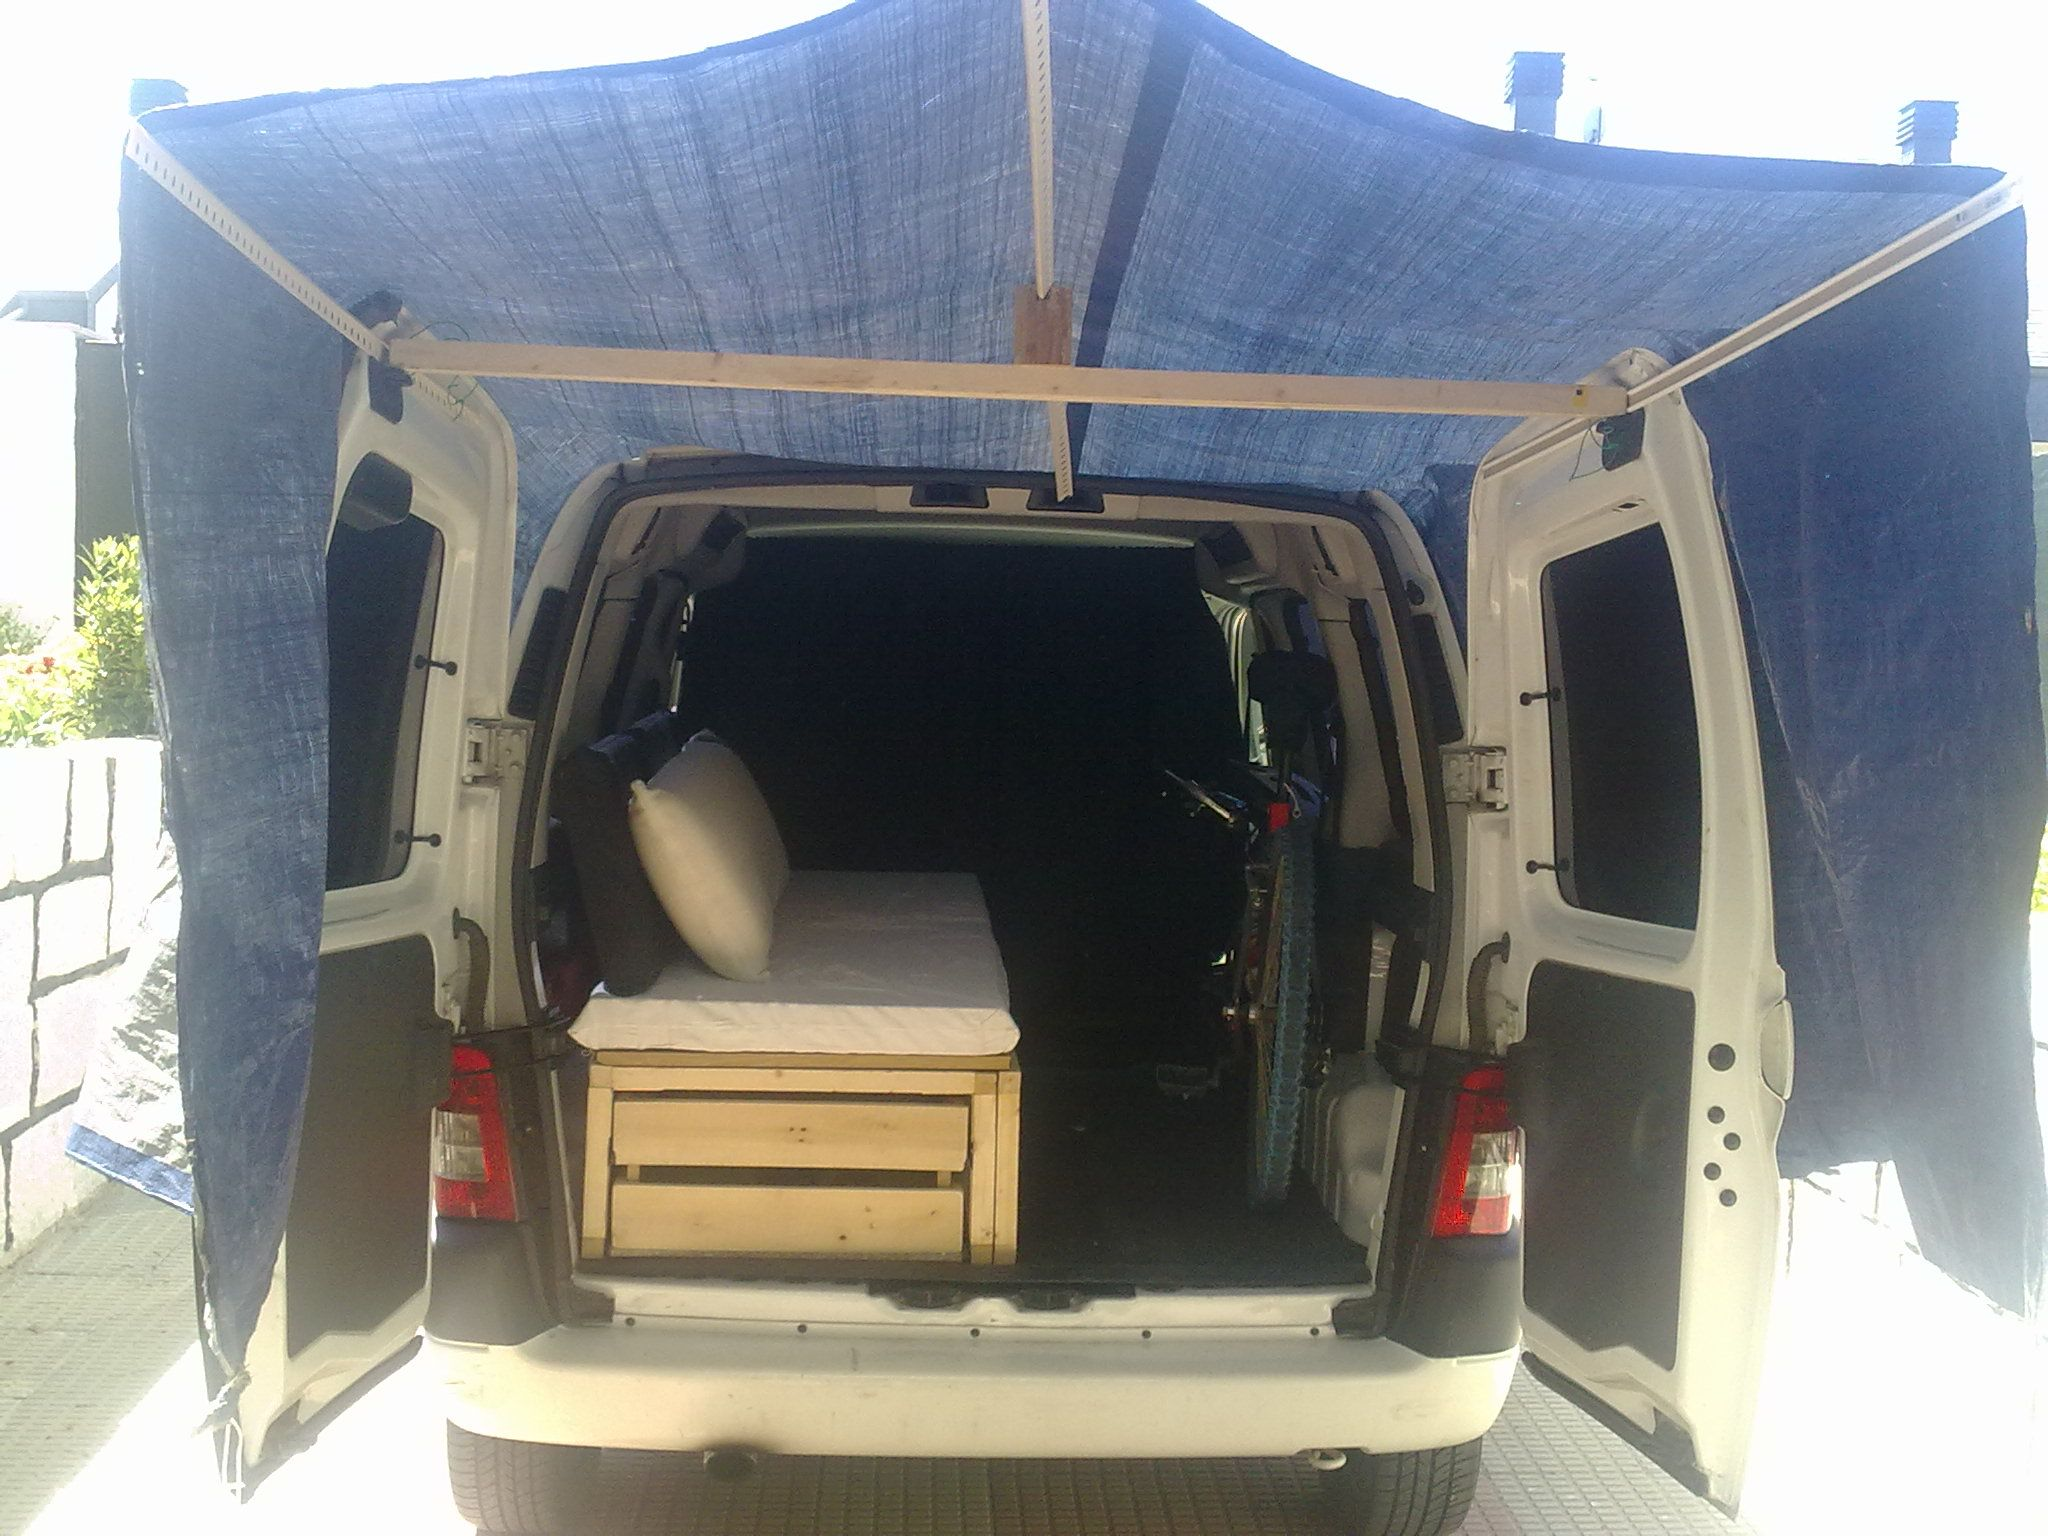 peugeot partner 2 0 hdi la furgovictim camper pinterest fourgon fourgon am nag et. Black Bedroom Furniture Sets. Home Design Ideas